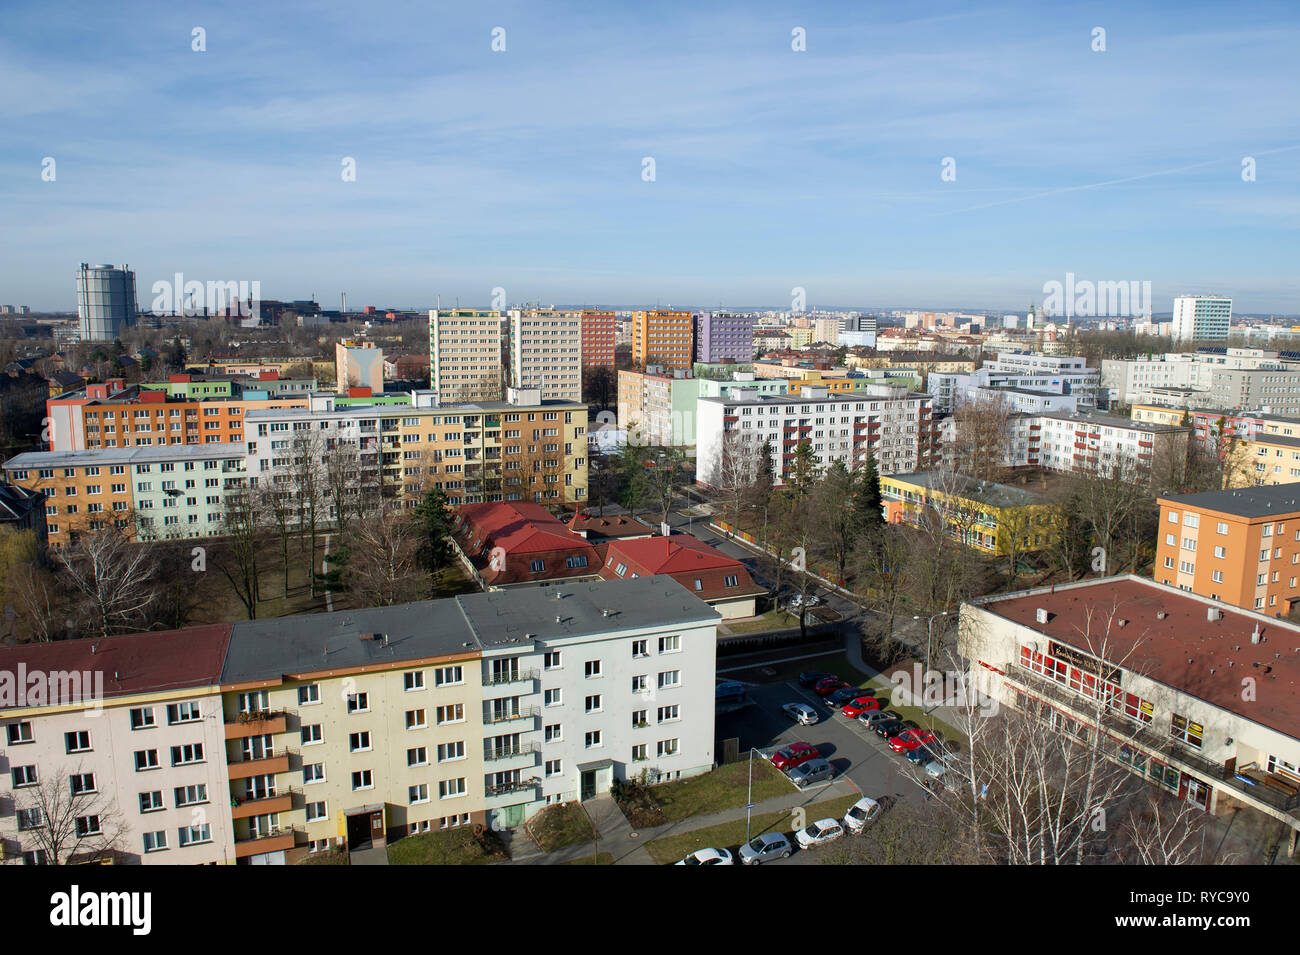 Apartment buildings in Ostrava, Czech Republic - Stock Image